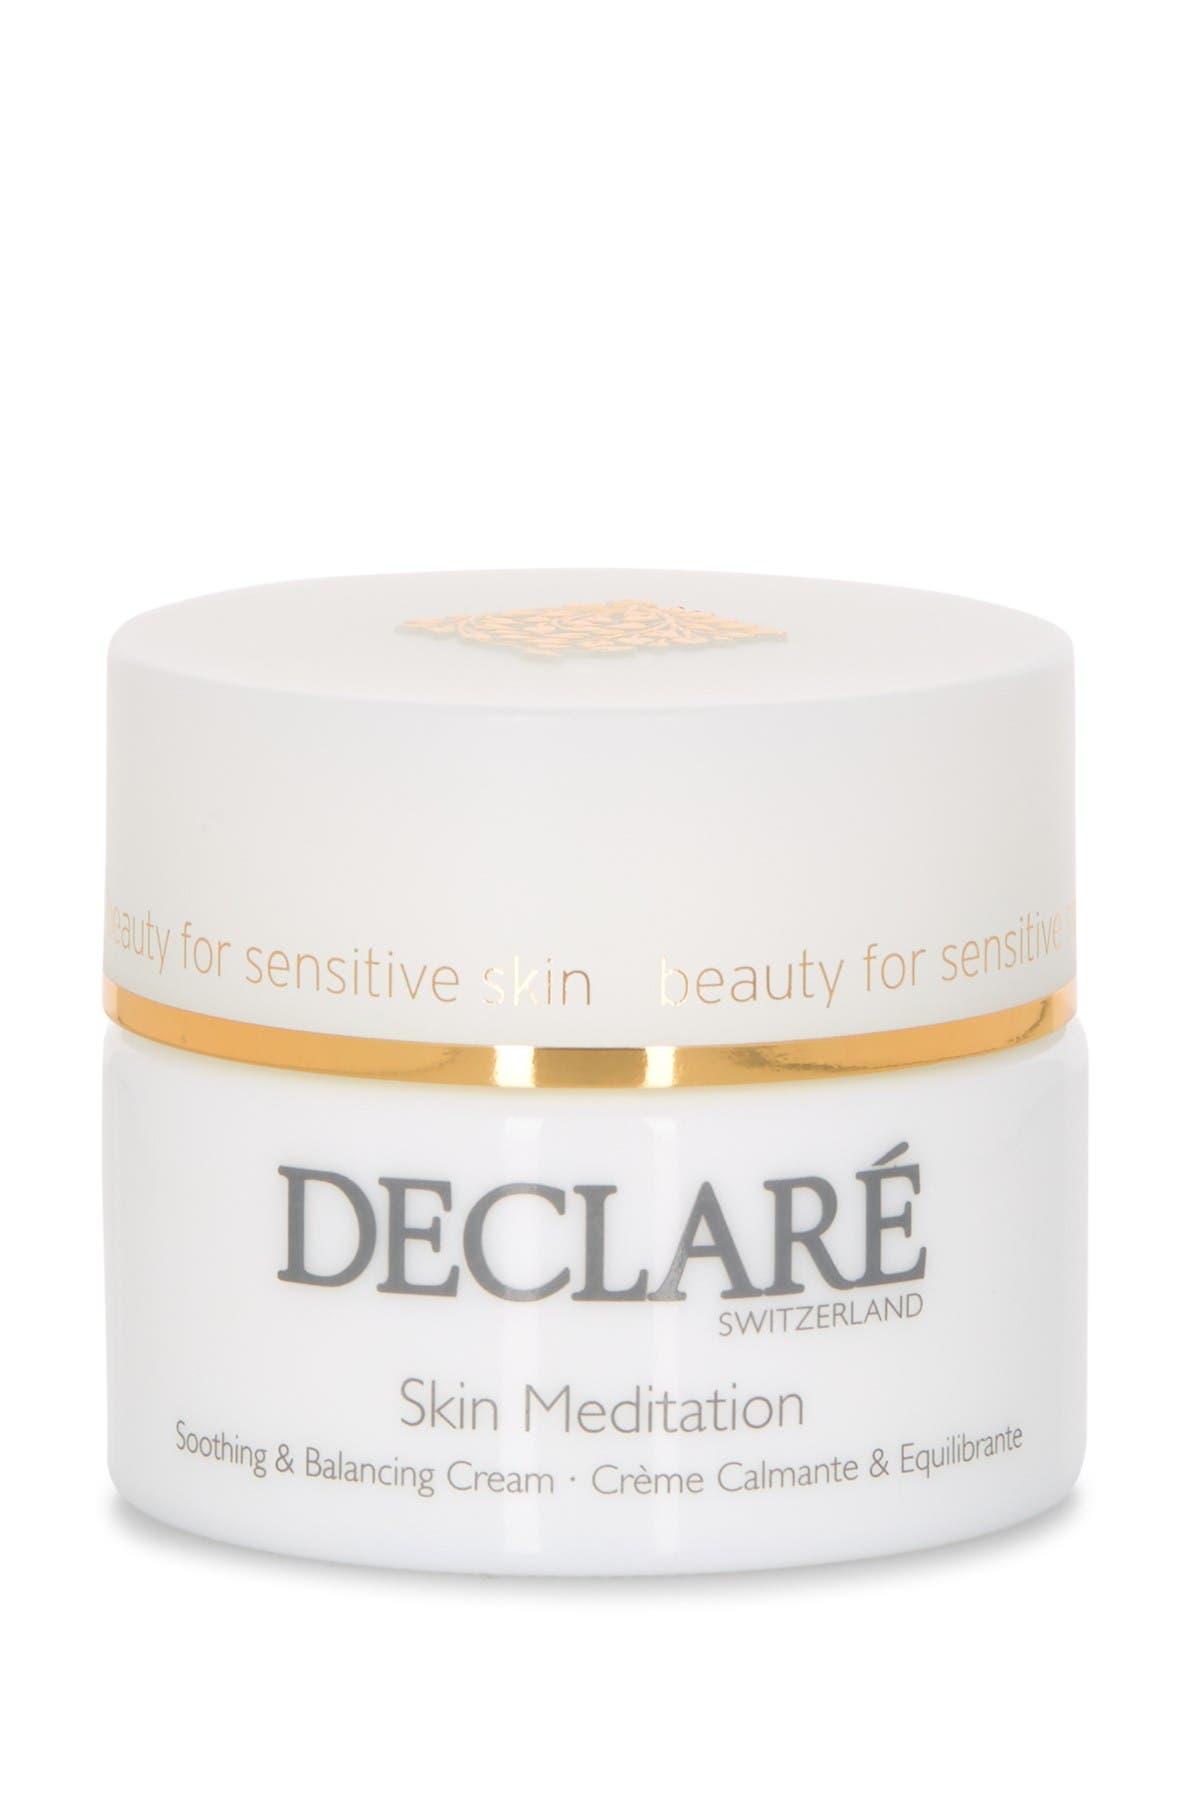 Image of DECLARE Skin Meditation Soothing & Balancing Cream